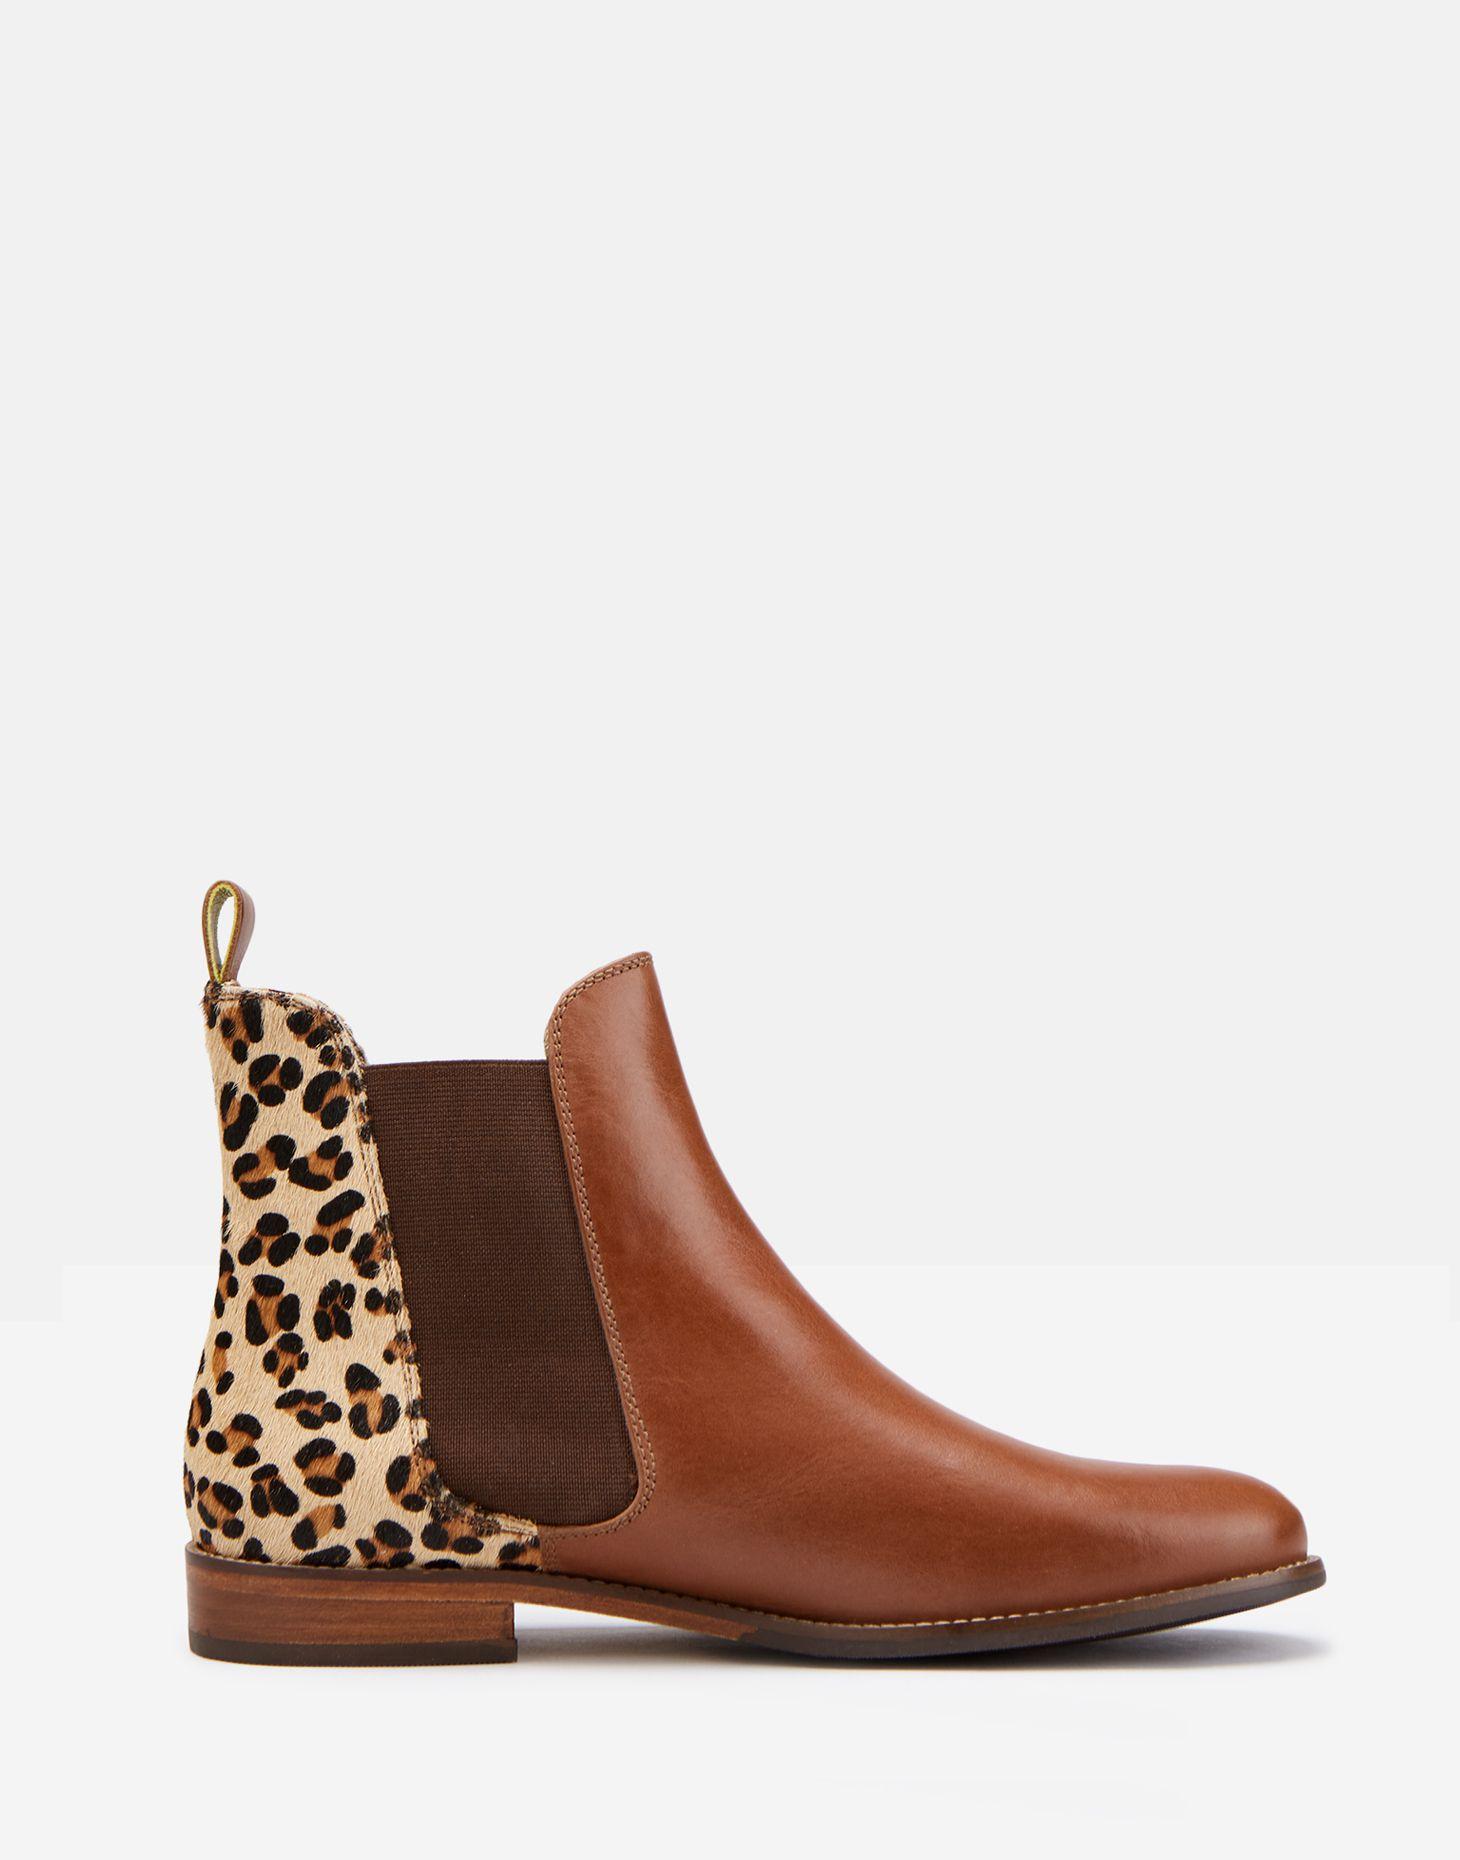 b5420d3a62147 Westbourne LEOPARD Premium Chelsea Boot | Joules US